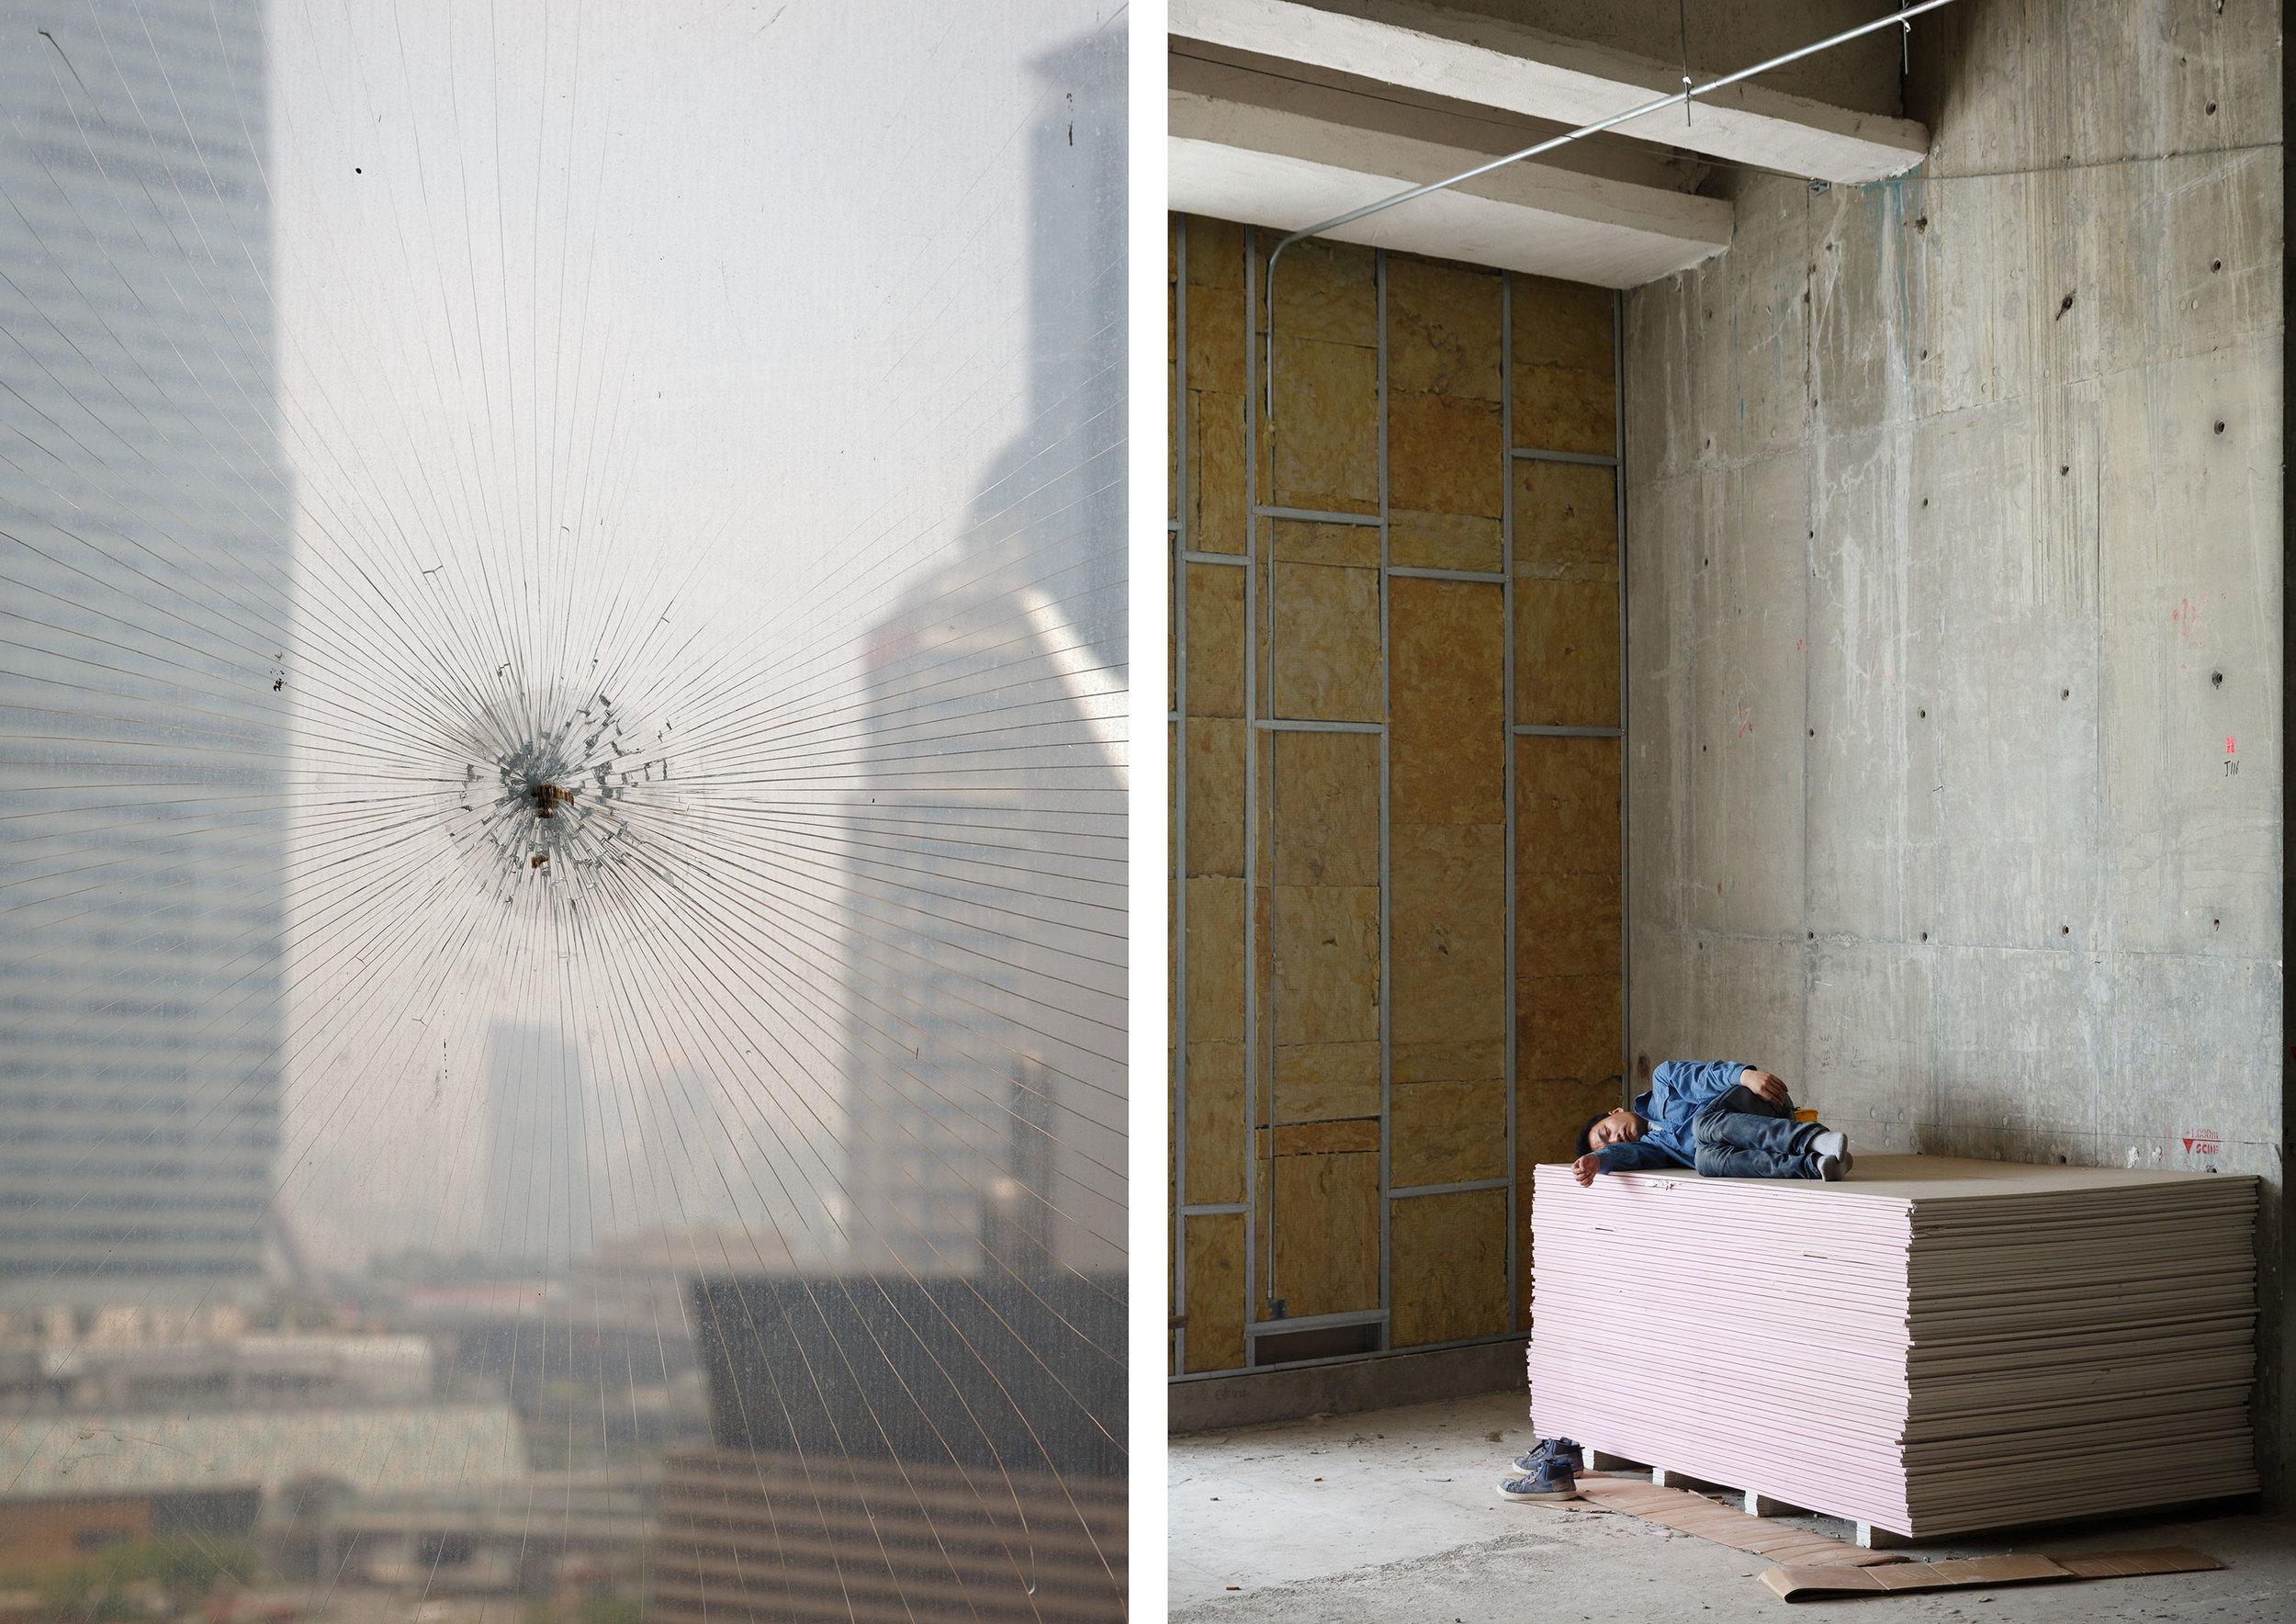 Shanghai_Tower-workers-and-building7.jpg